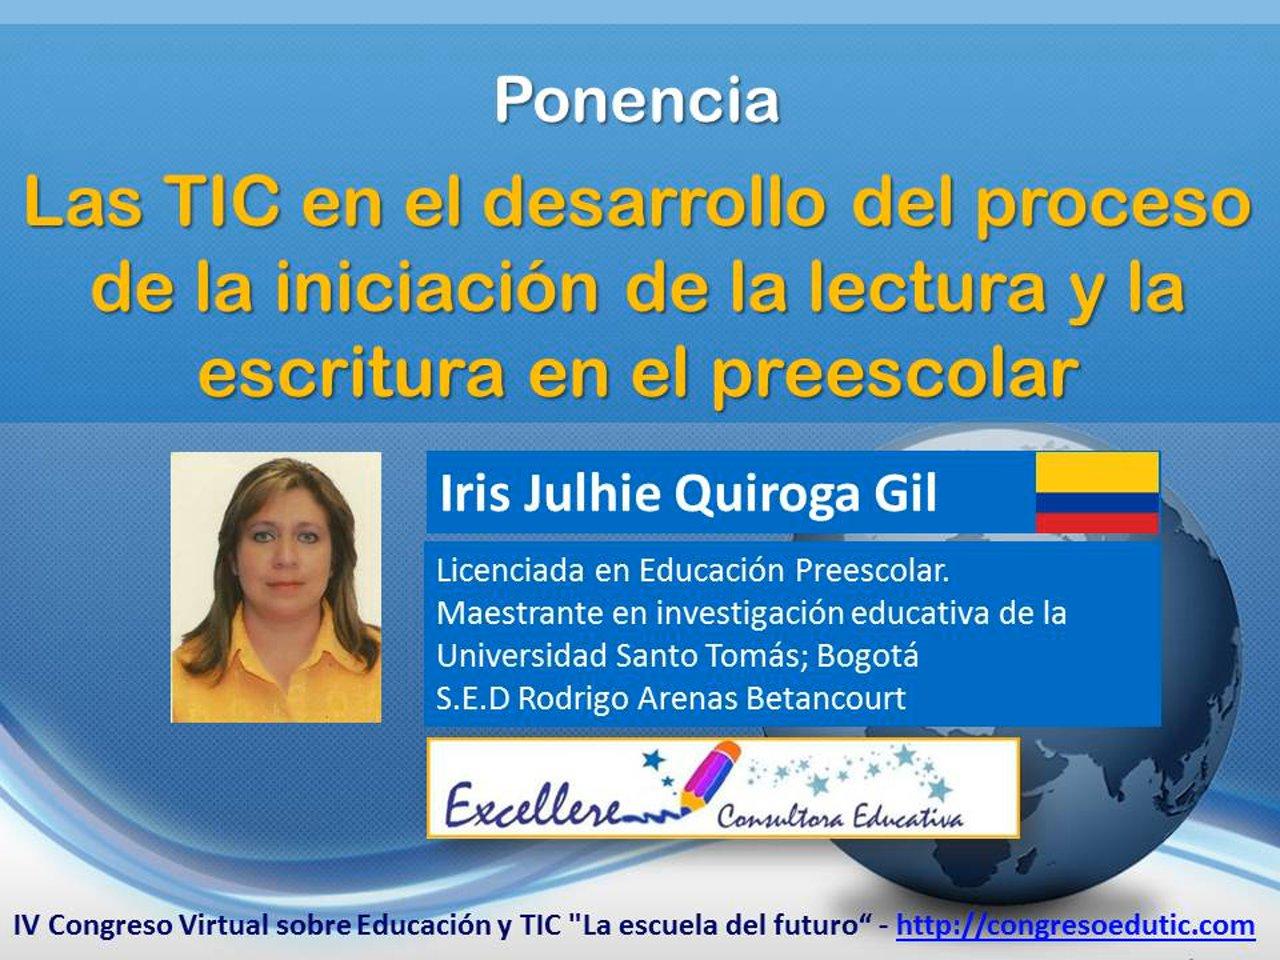 Ponencia de Iris Julhie Quiroga Gil: Las TIC en el nivel preescolar